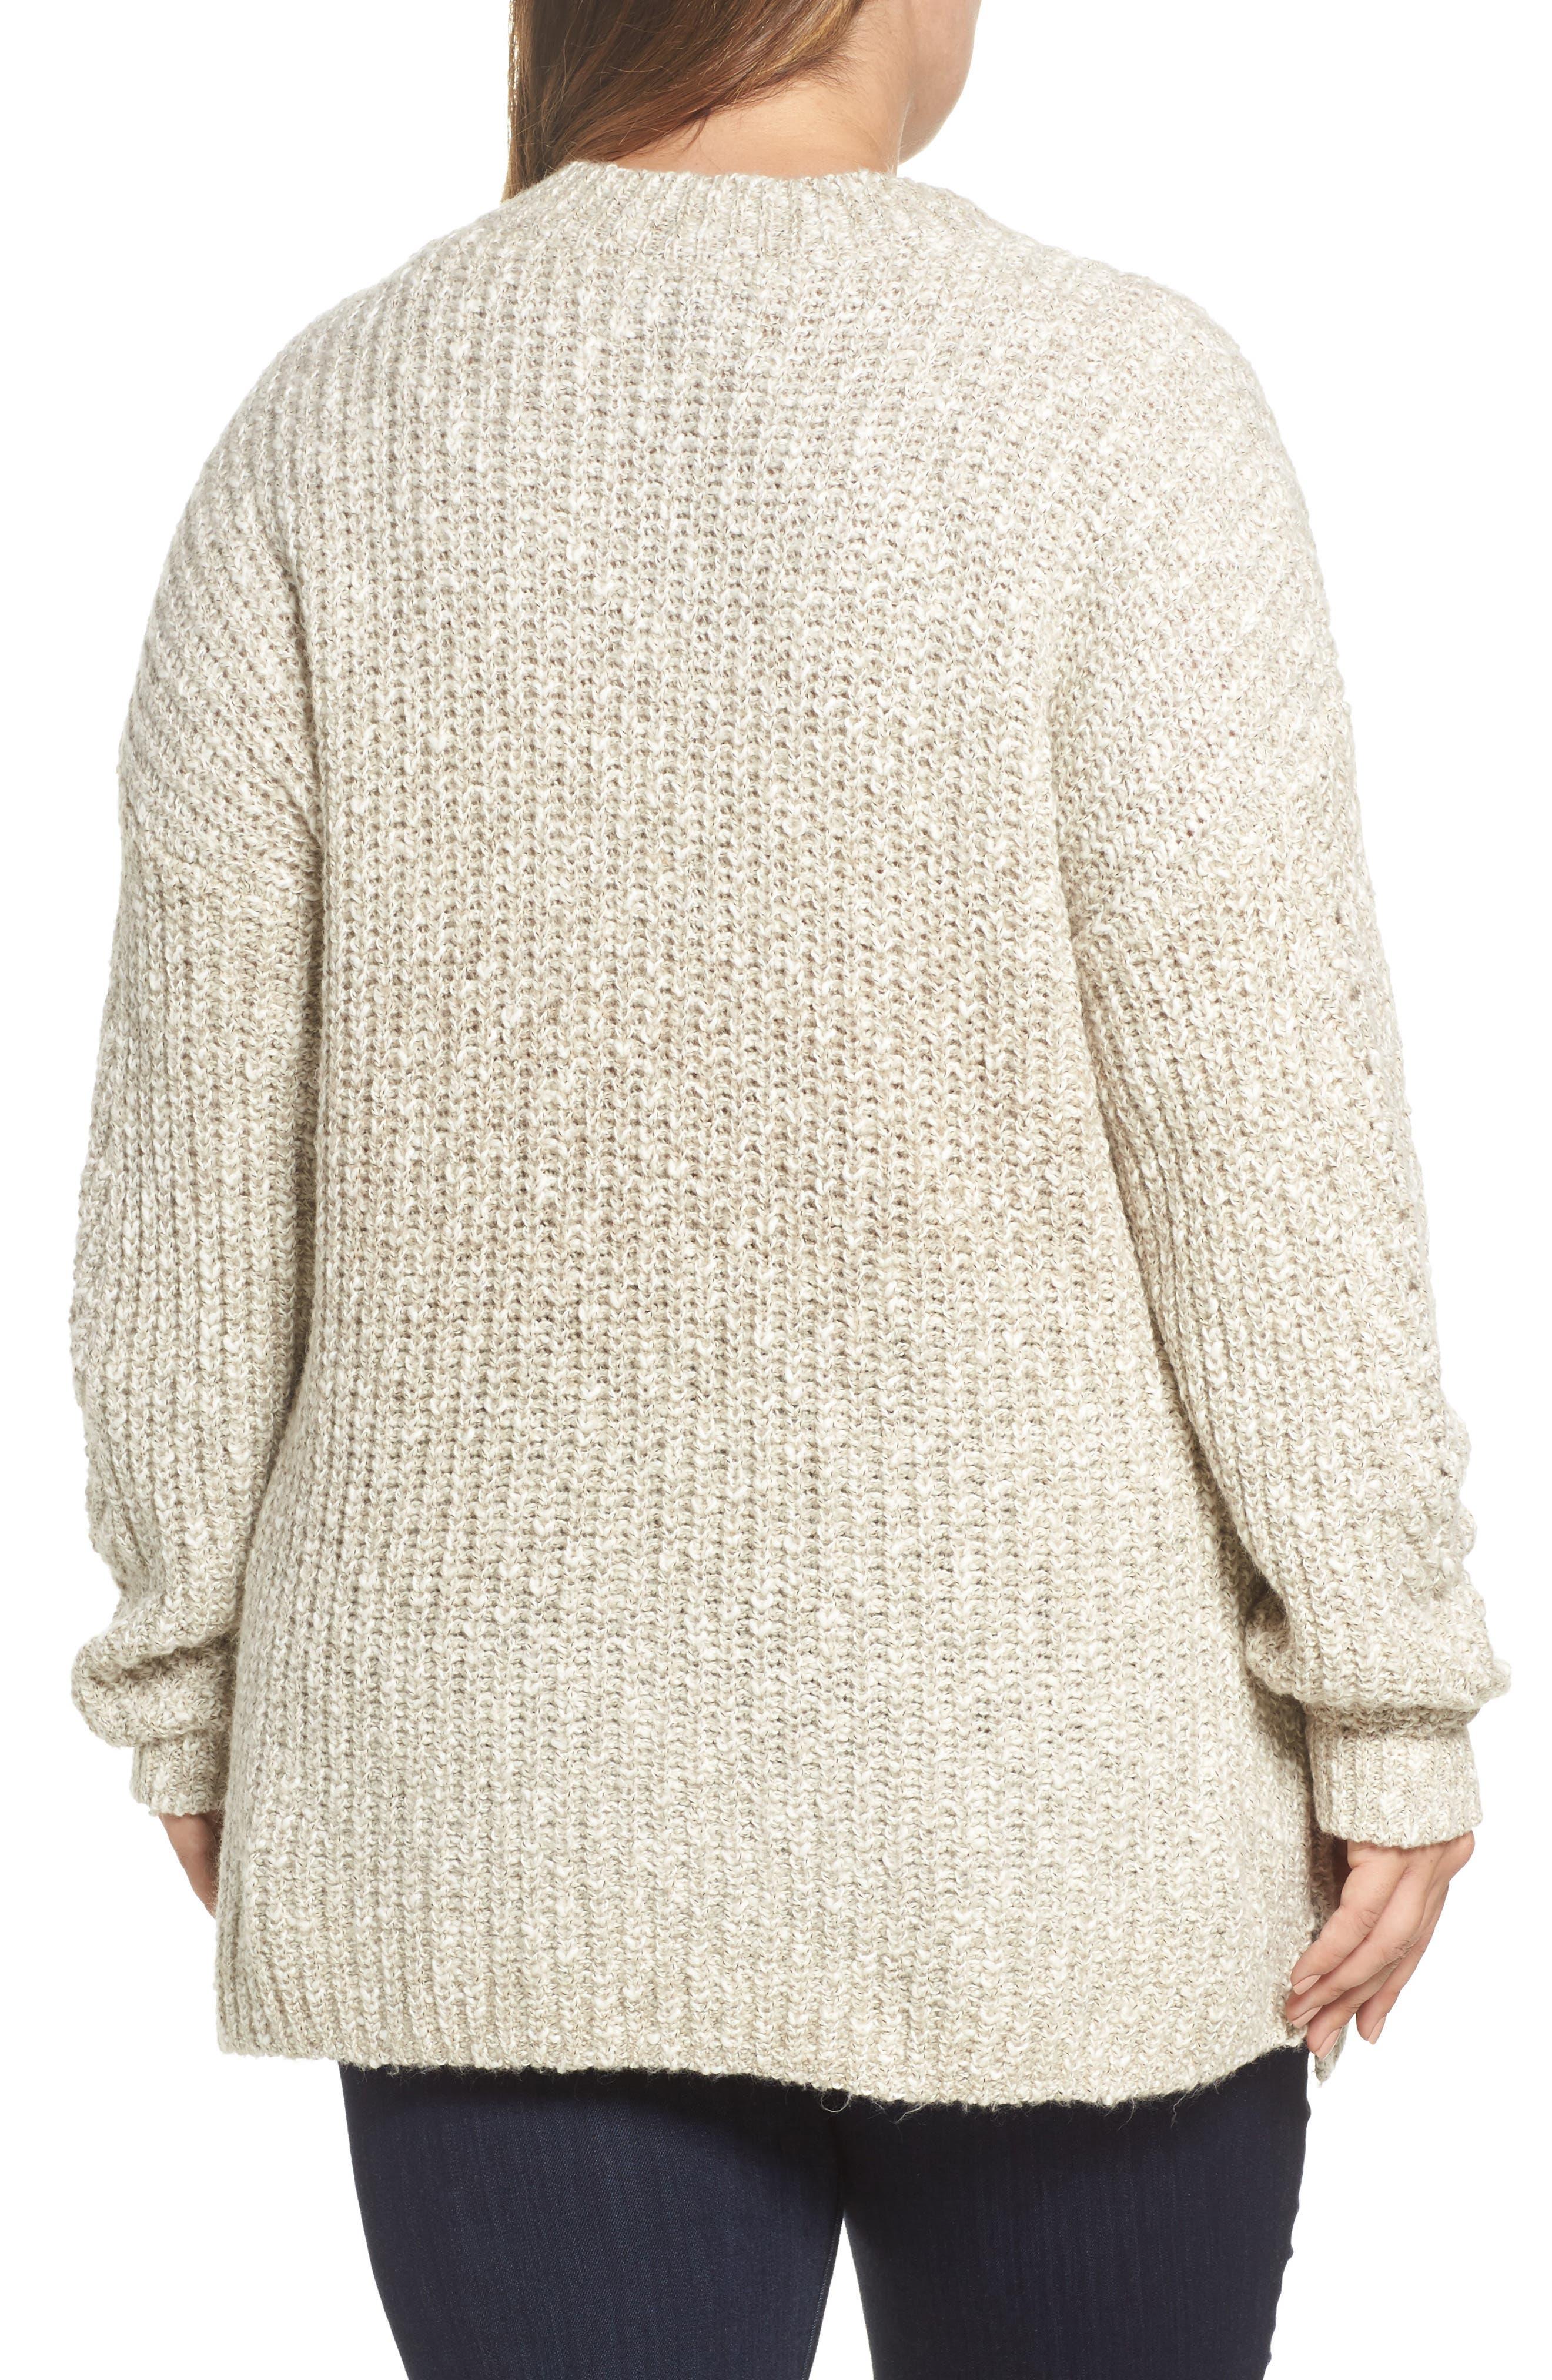 Open Stitch Sweater,                             Alternate thumbnail 2, color,                             Natural Multi